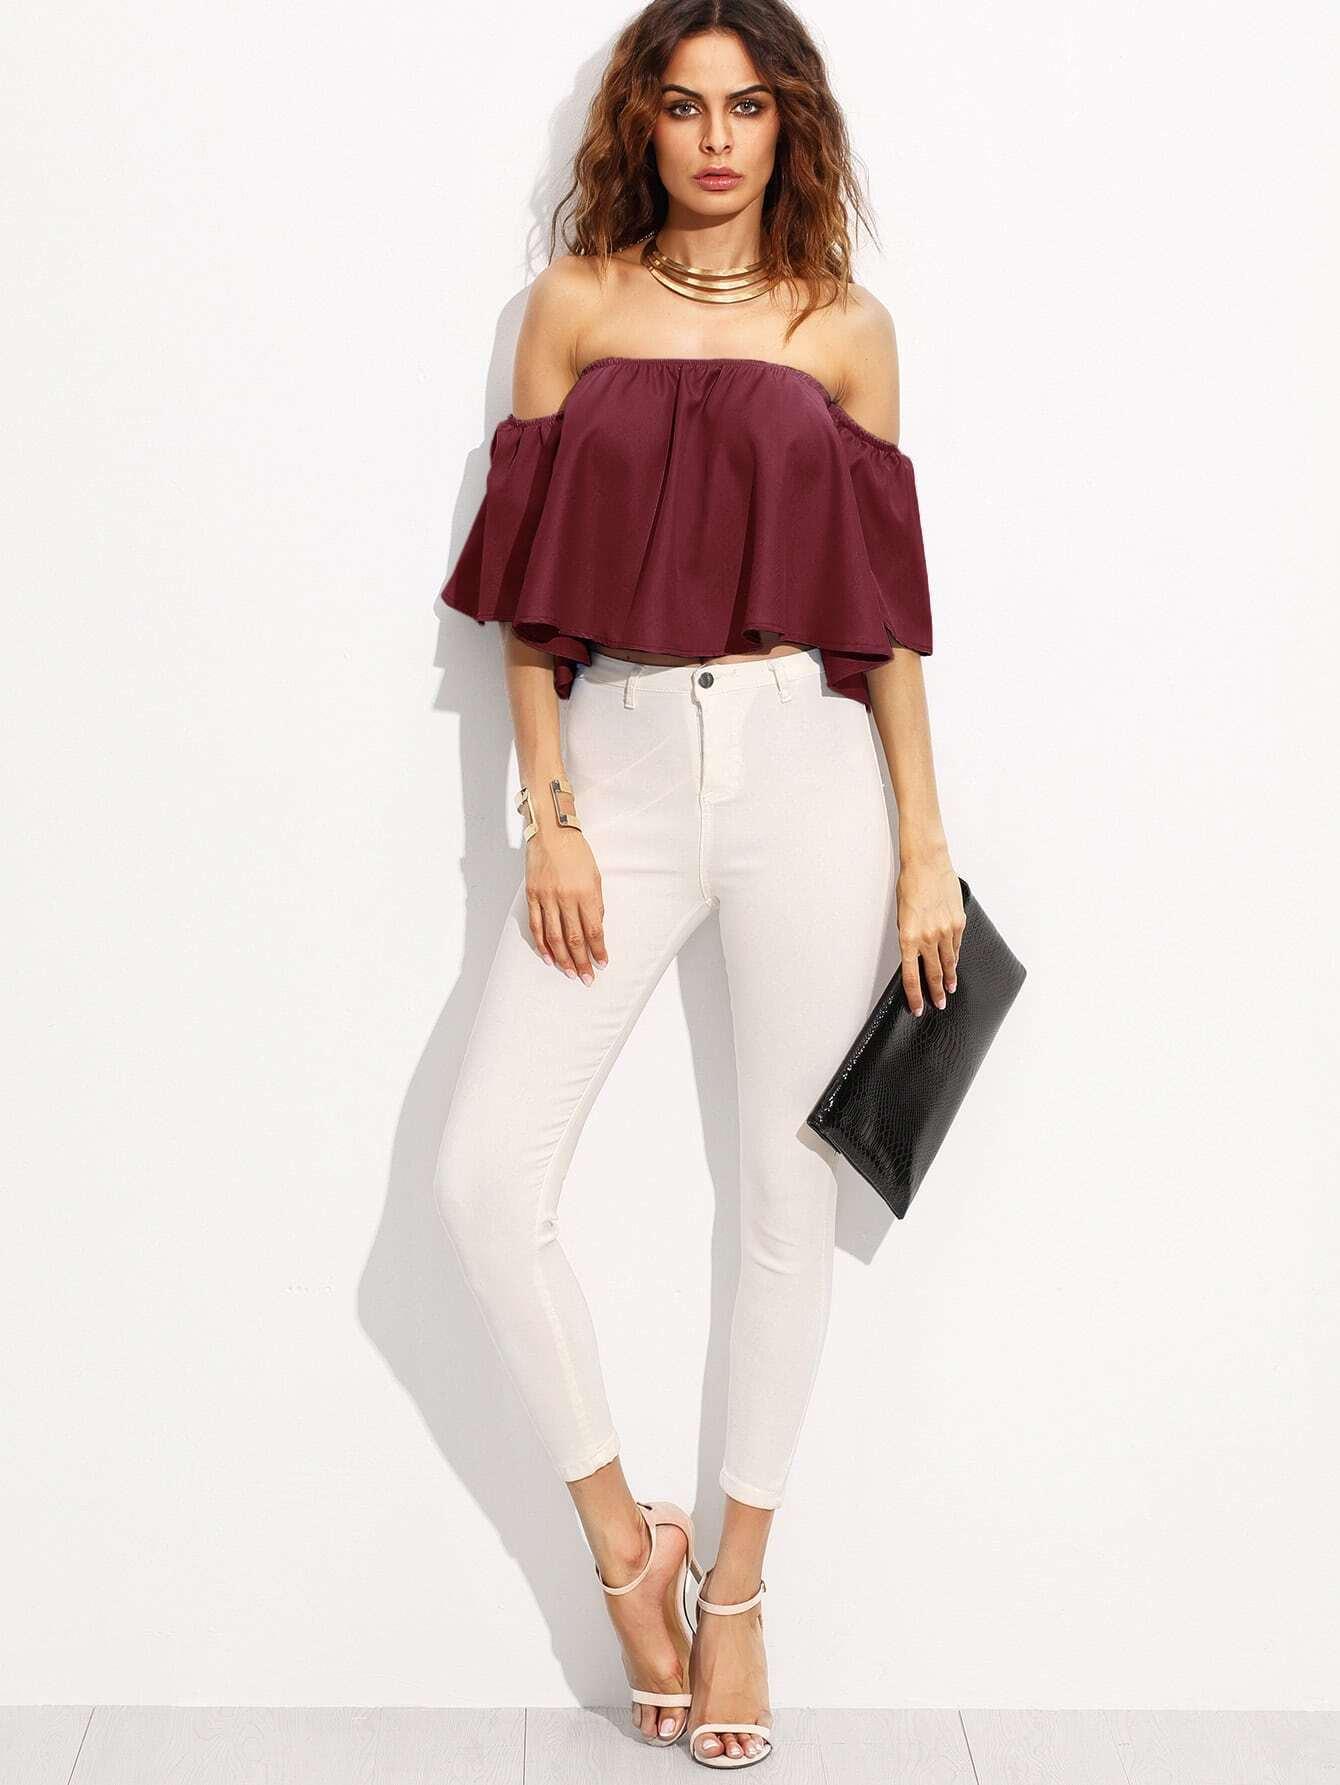 blouse170217102_2